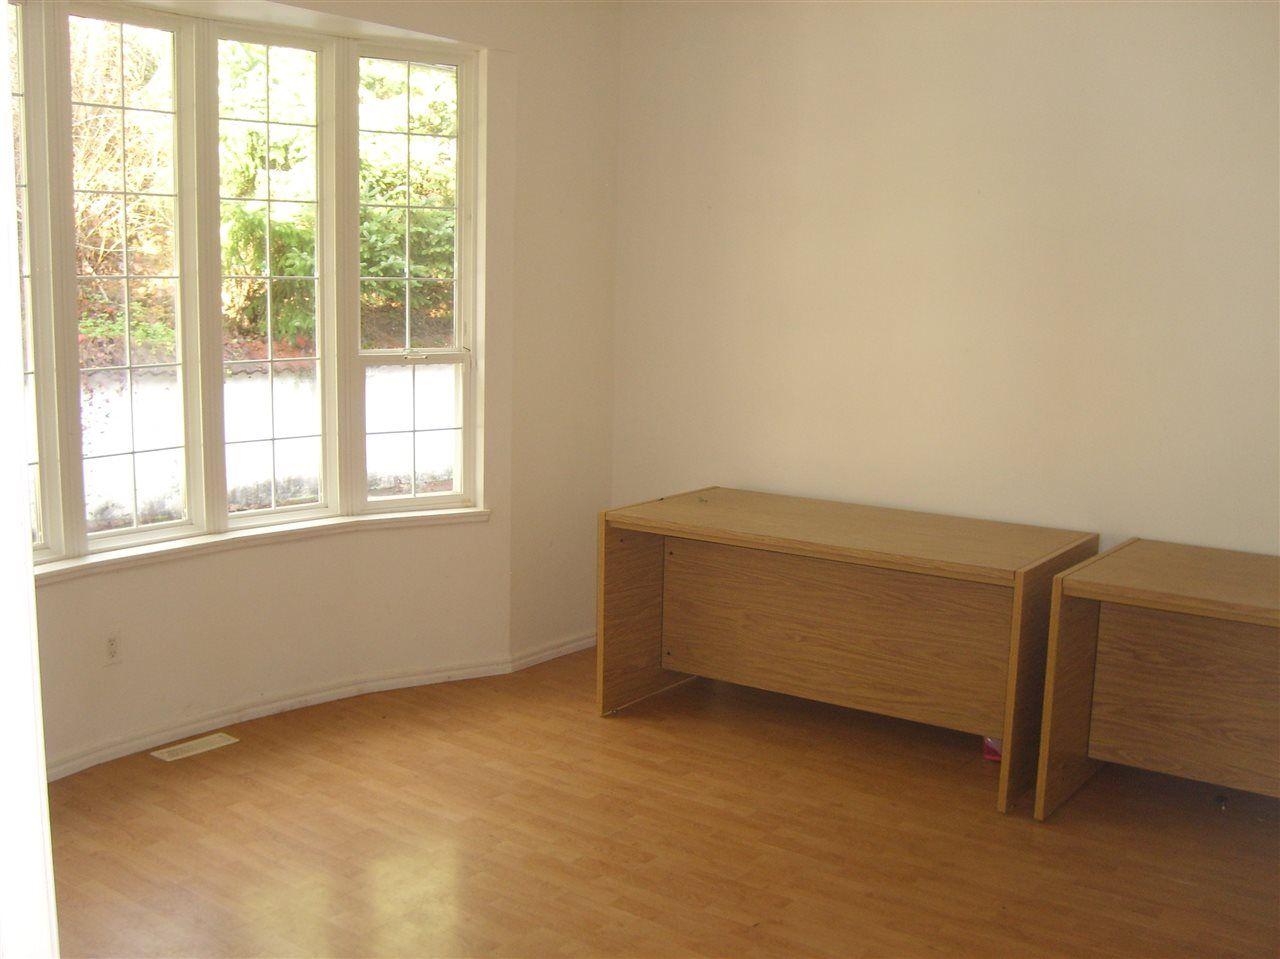 Photo 14: Photos: 28640 123 Avenue in Maple Ridge: Northeast House for sale : MLS®# R2419989